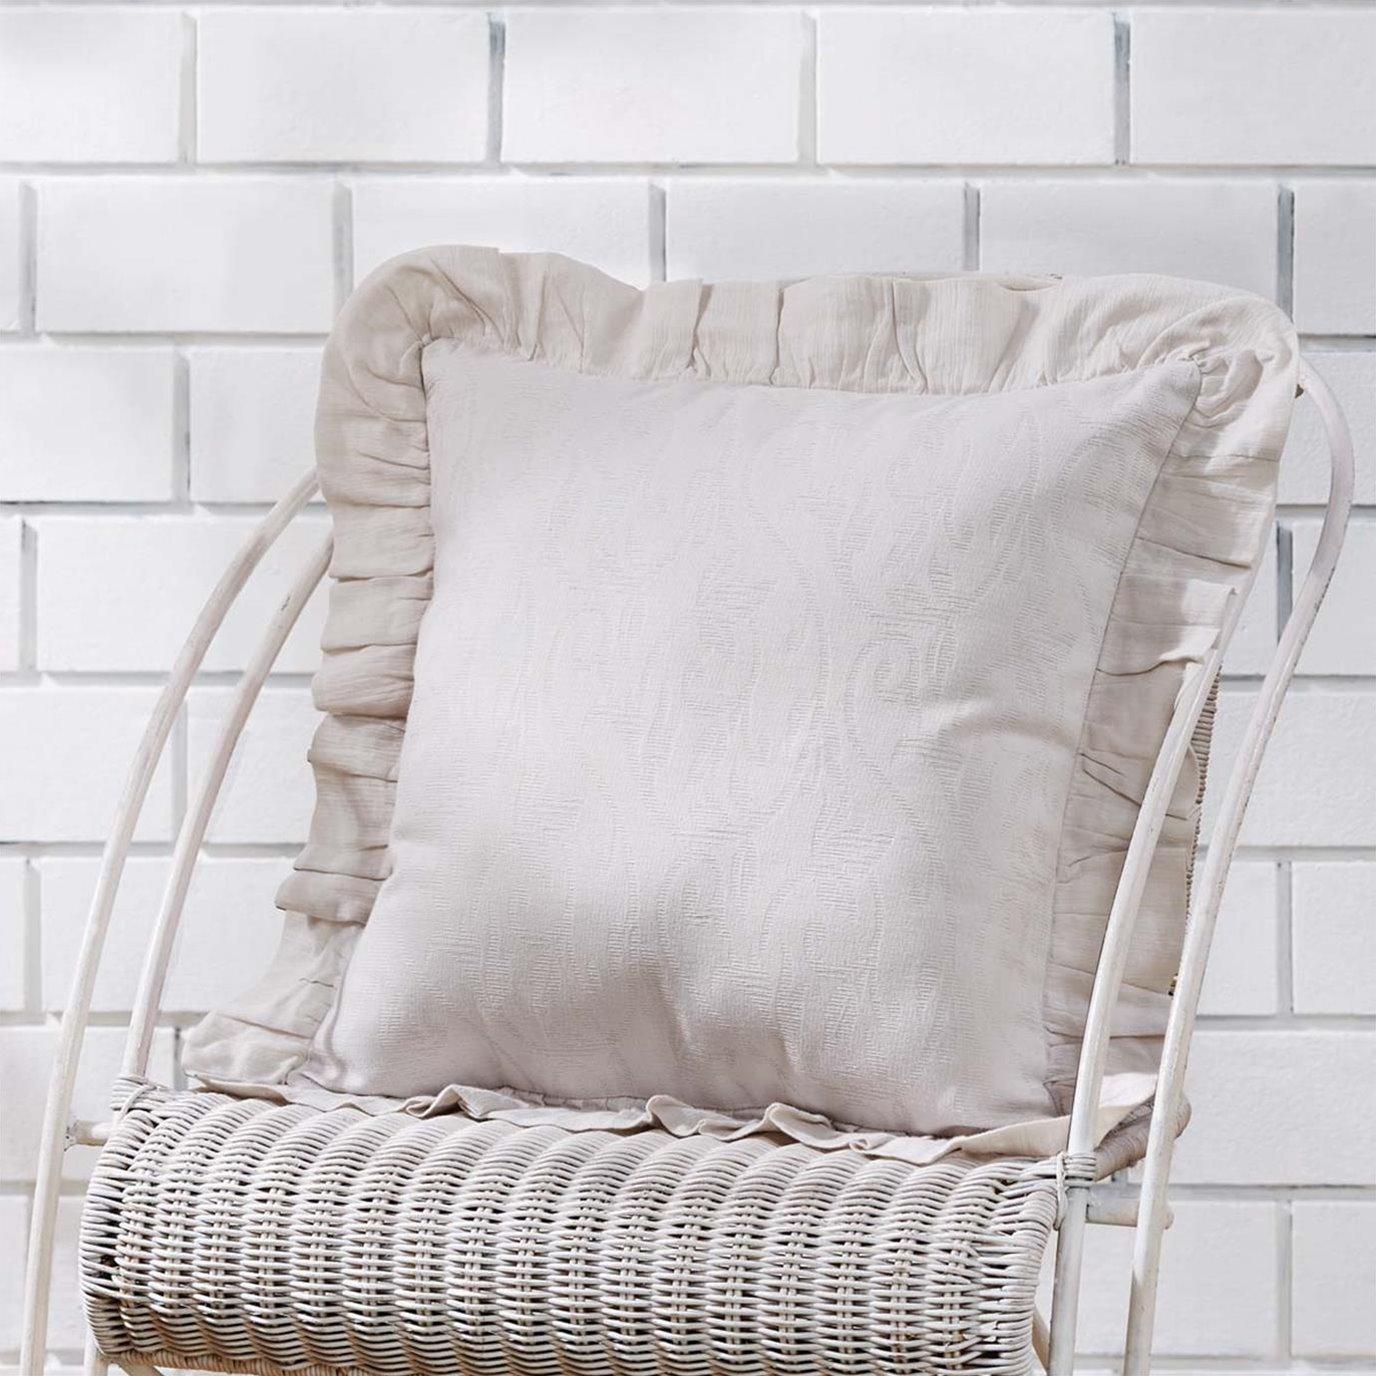 Corrine Ruffle Pillow Cover 18x18